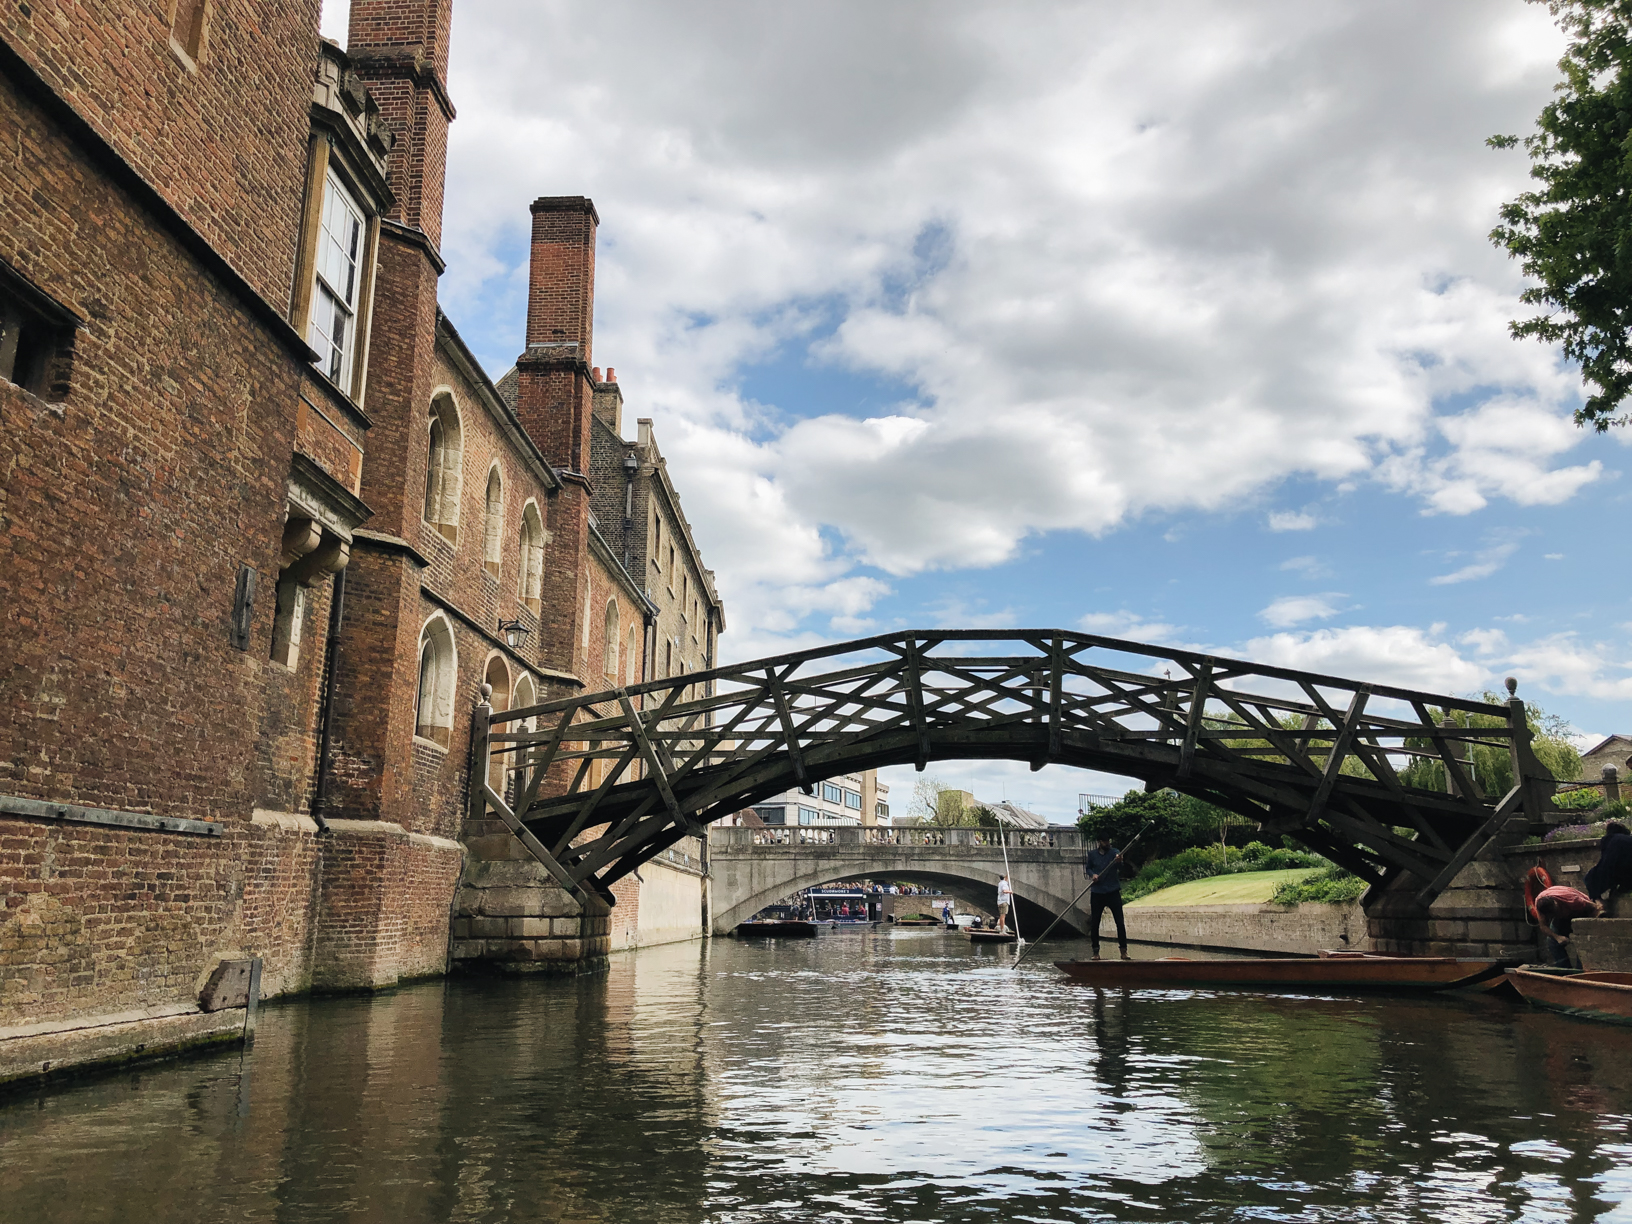 Punting-in-Cambridge-mathematical-bridge.jpg